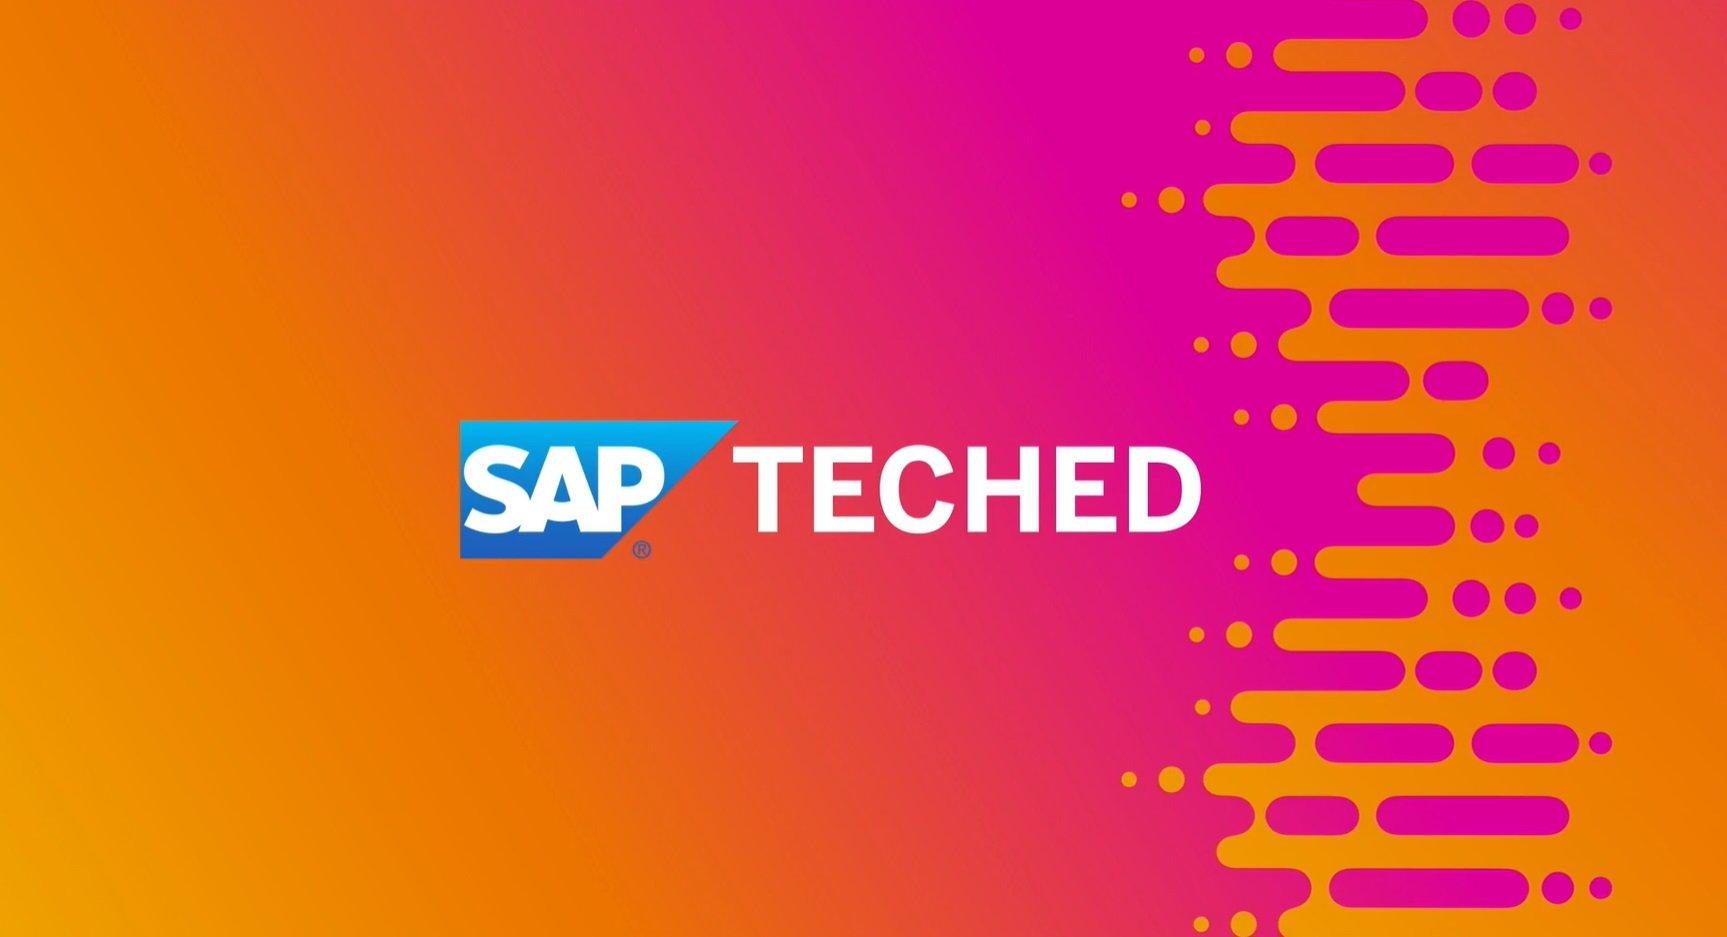 SAP tech ed image their branding